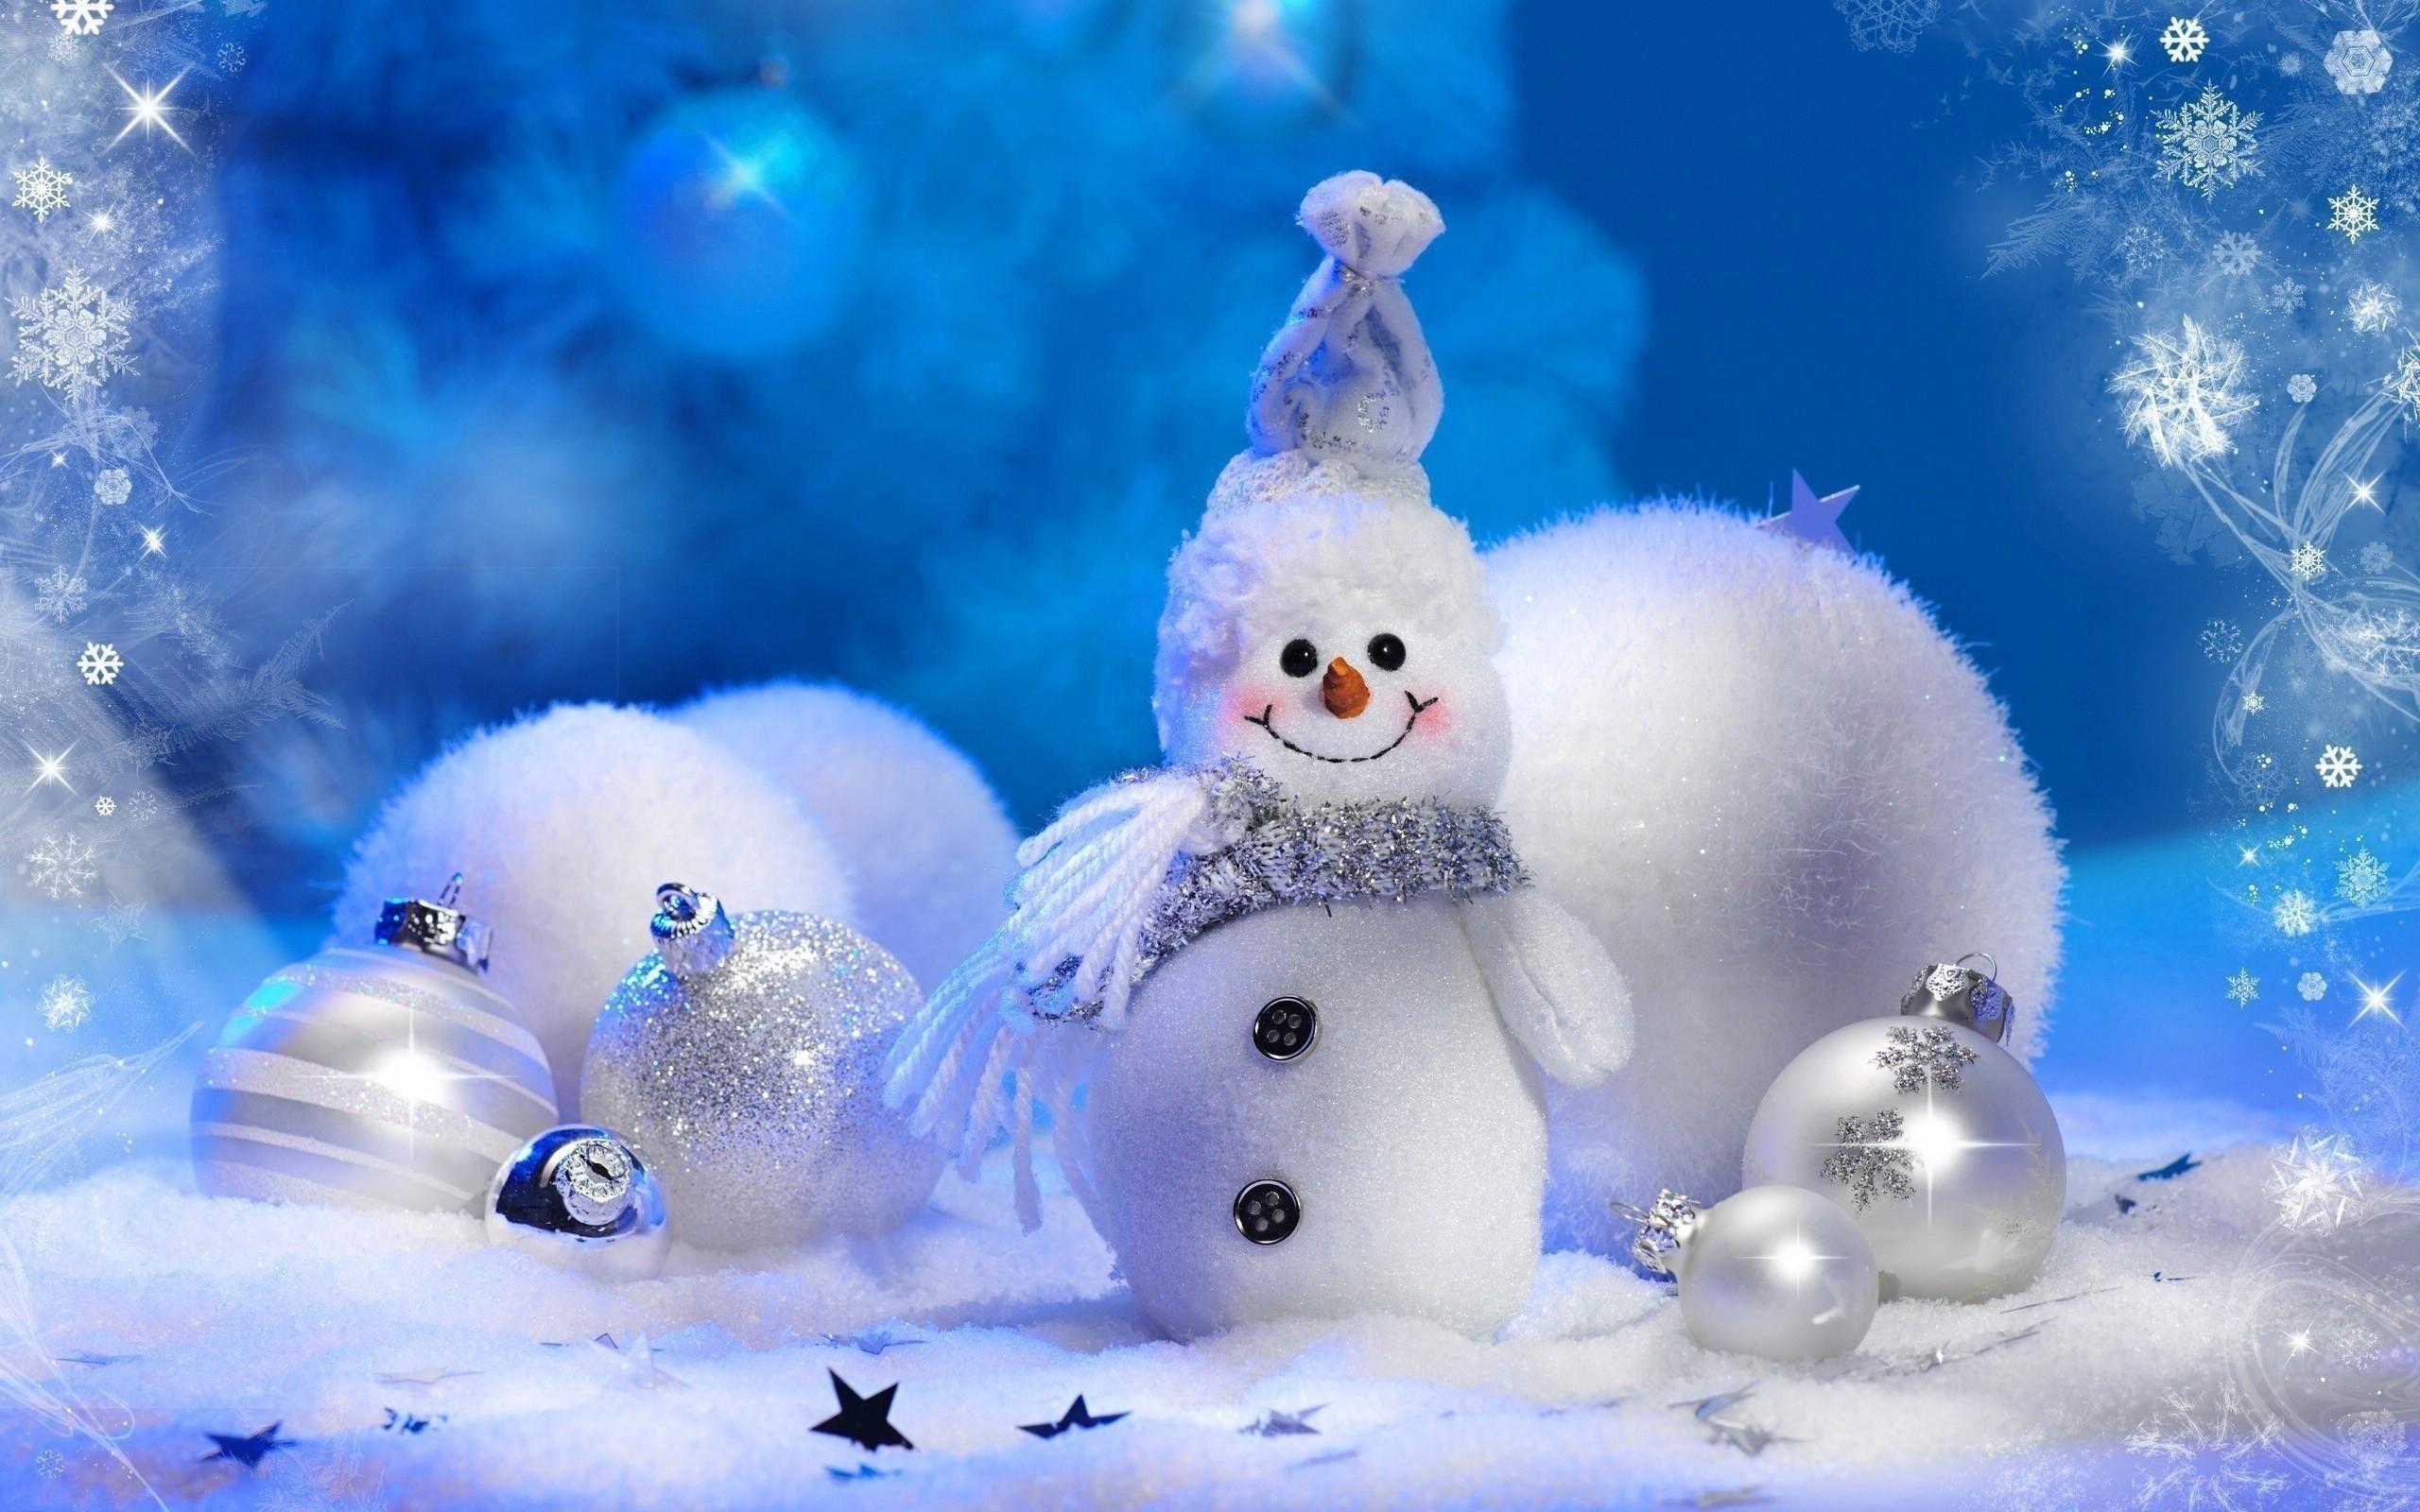 christmas winter scenes wallpaper (47+ images)